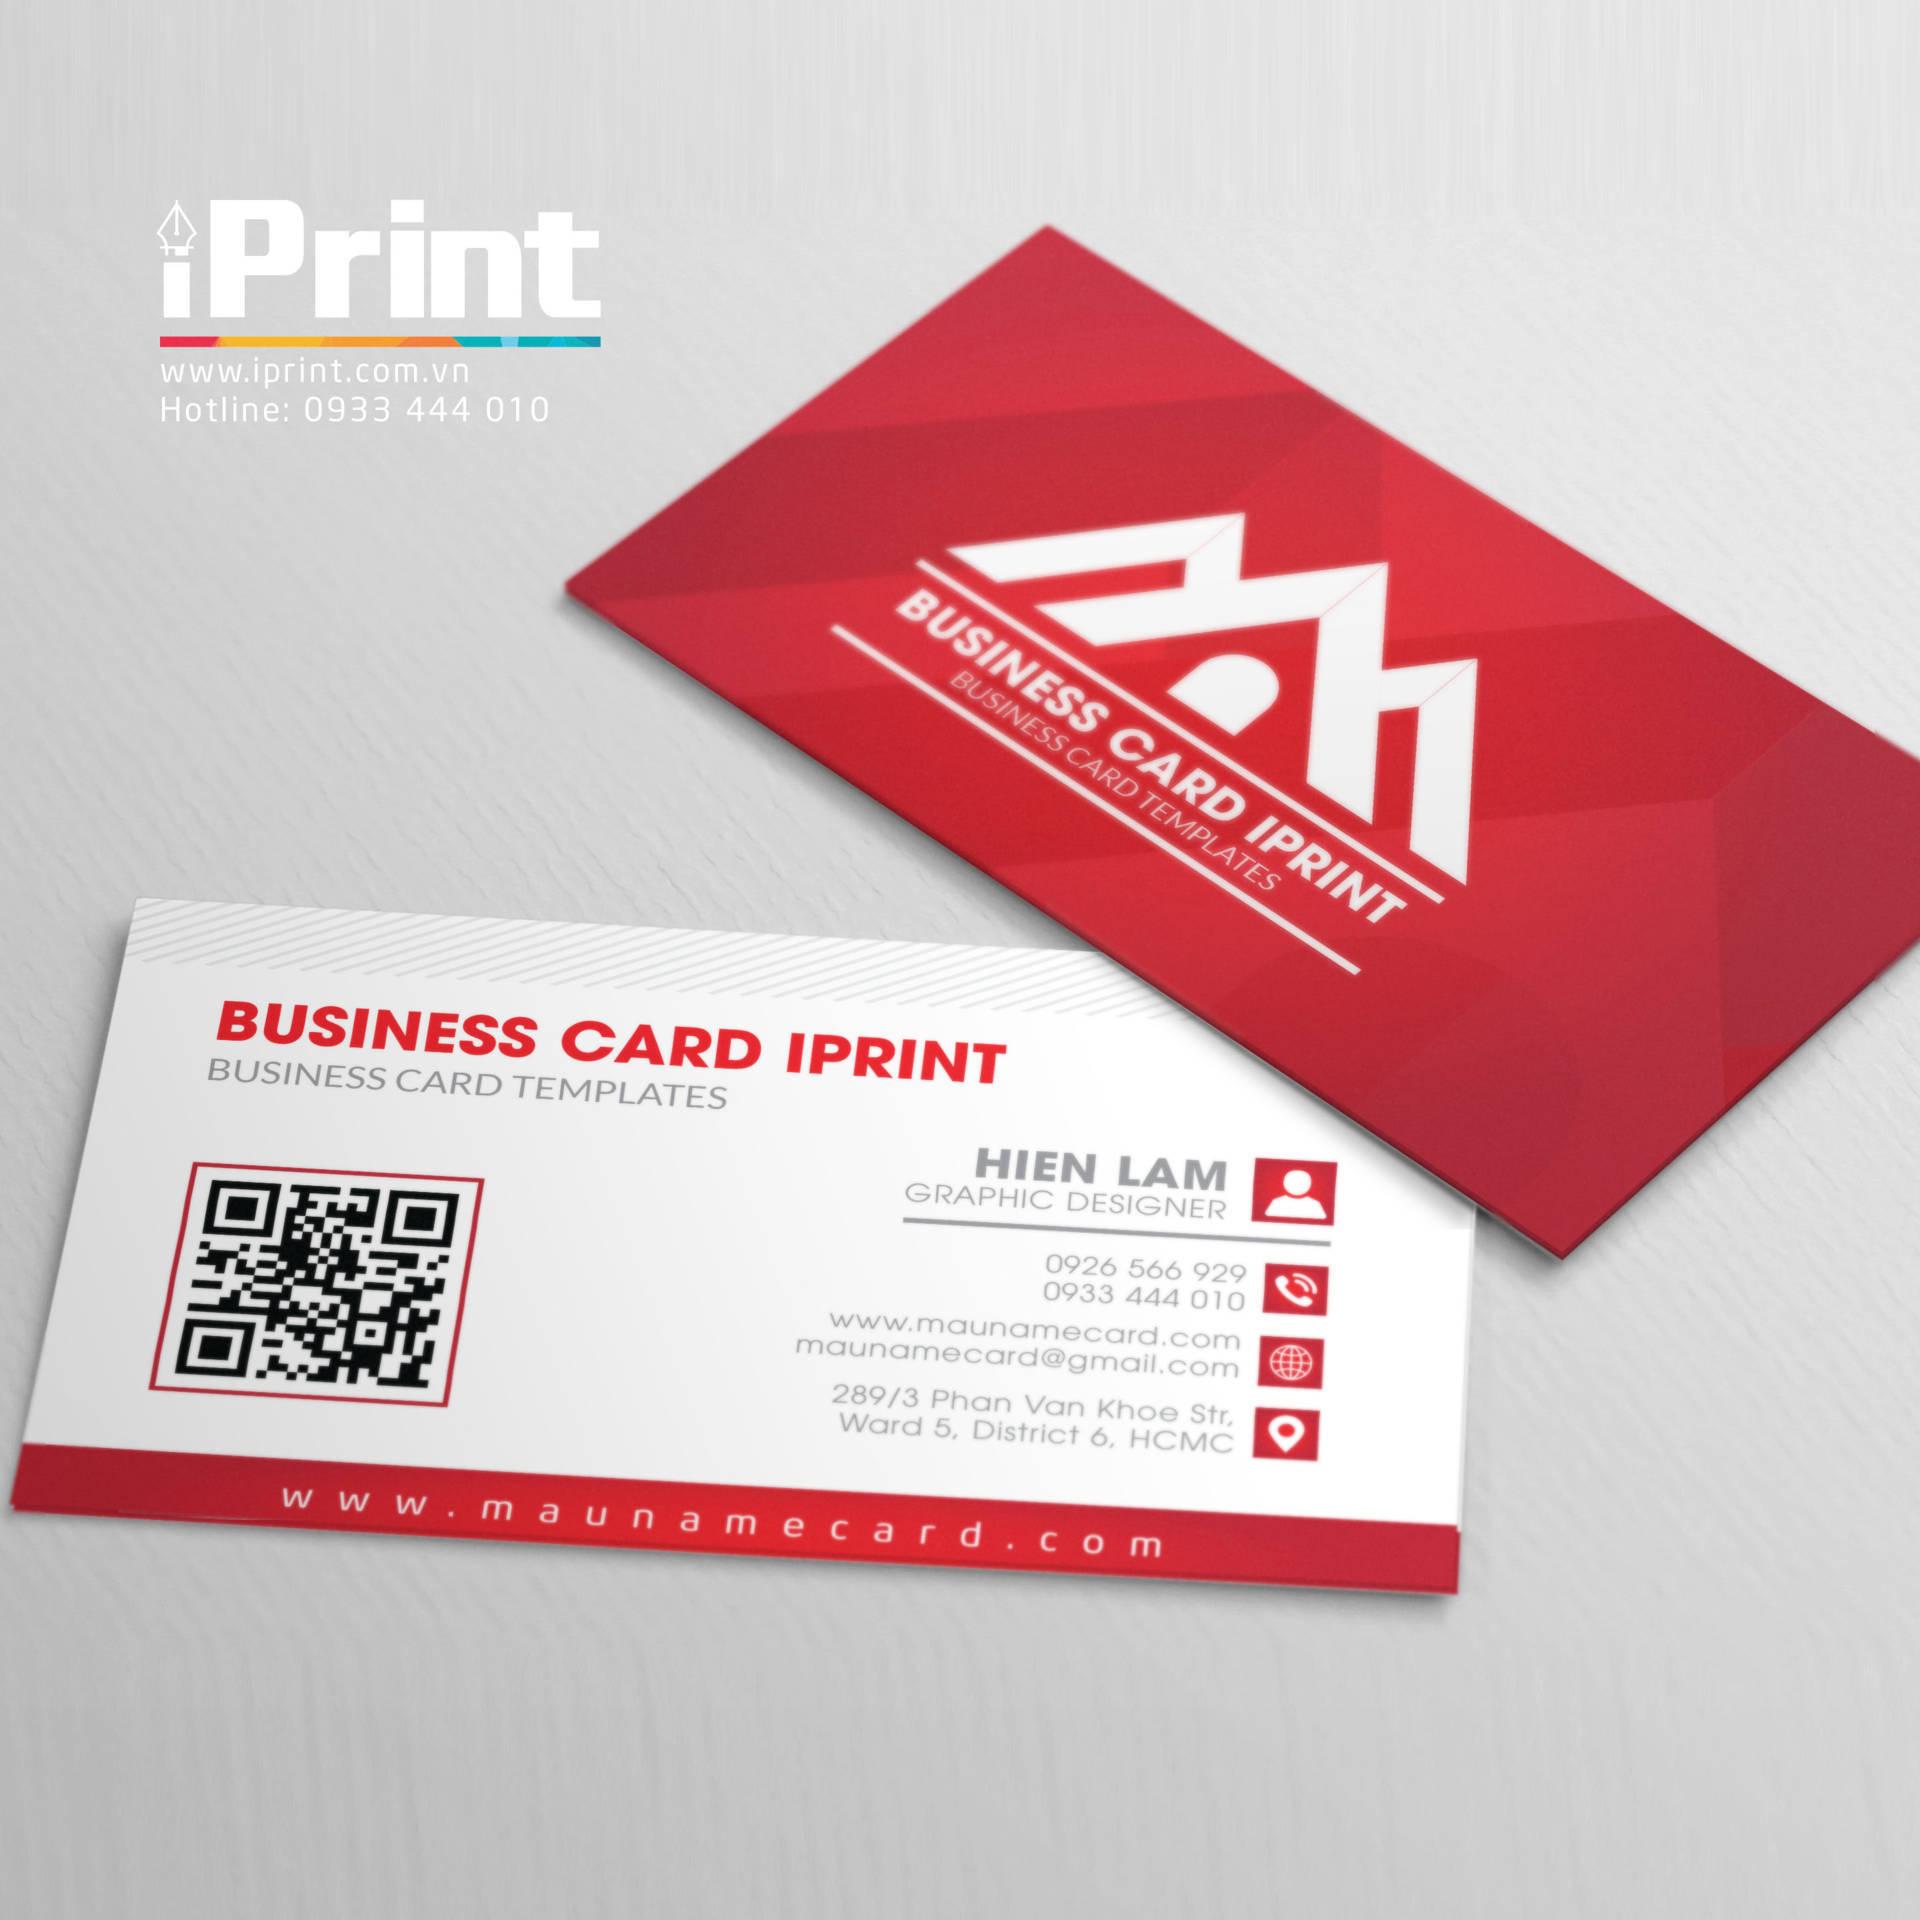 name card kinh doanh (175)